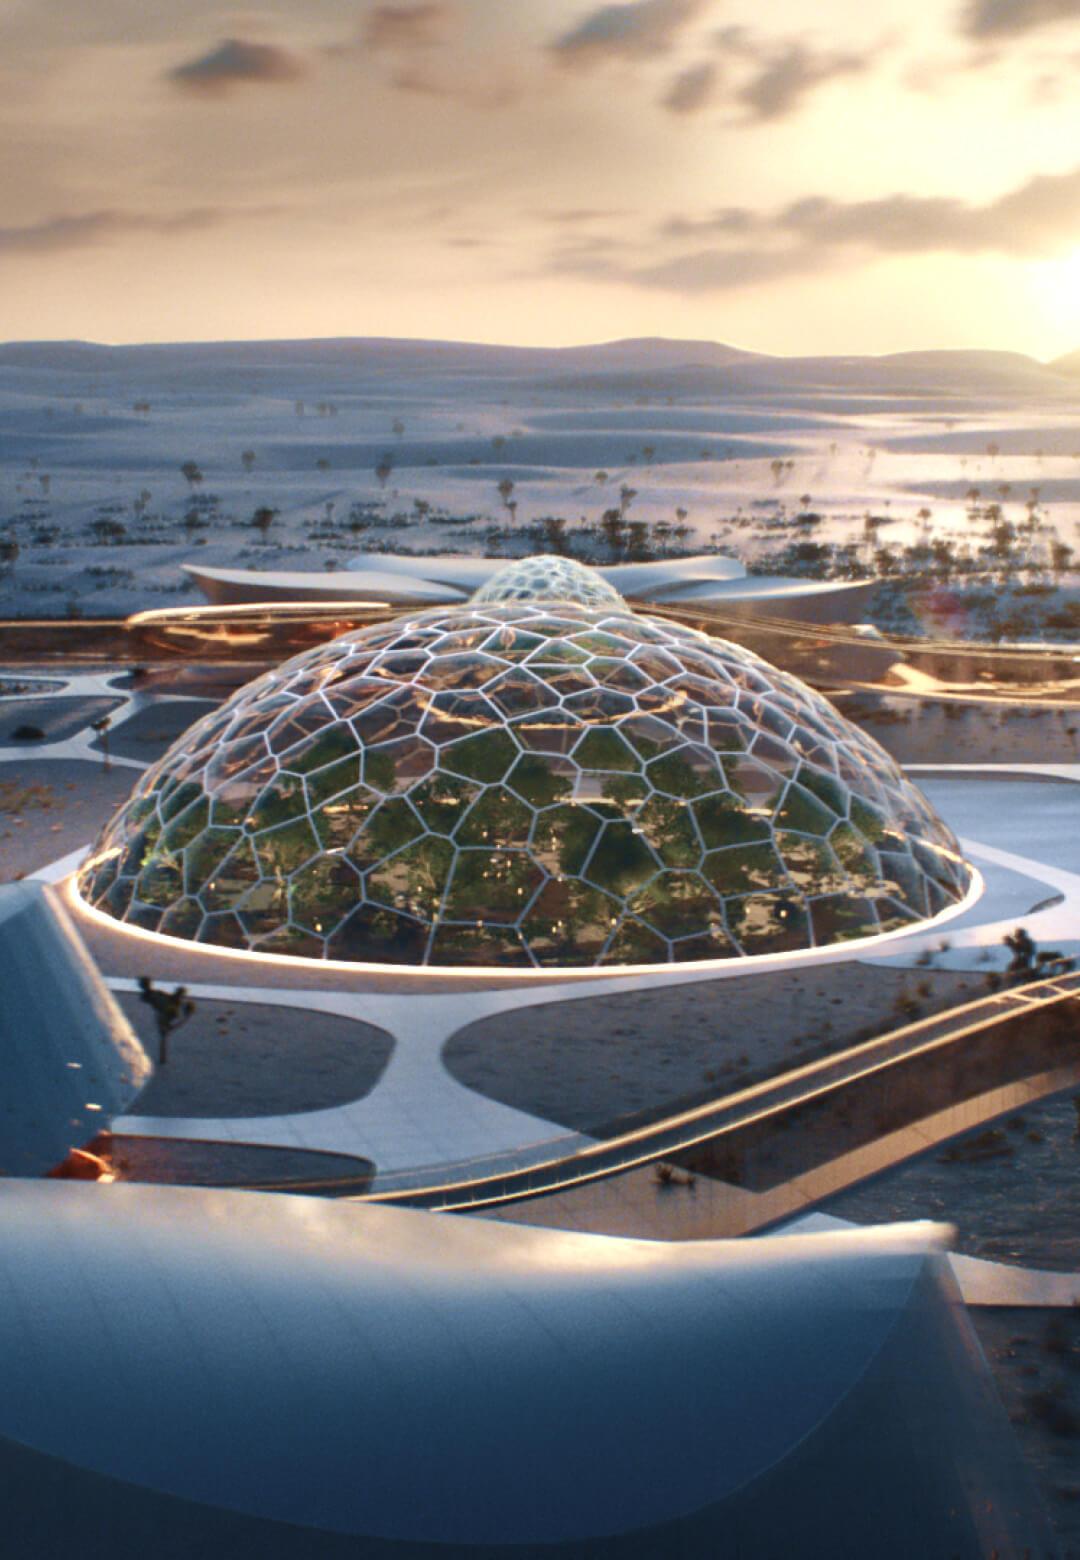 EBIOS: the first self-sufficient and bioregenerative village finds itself in Mojave Desert, California| EBIOS by Interstellar Lab | STIRworld